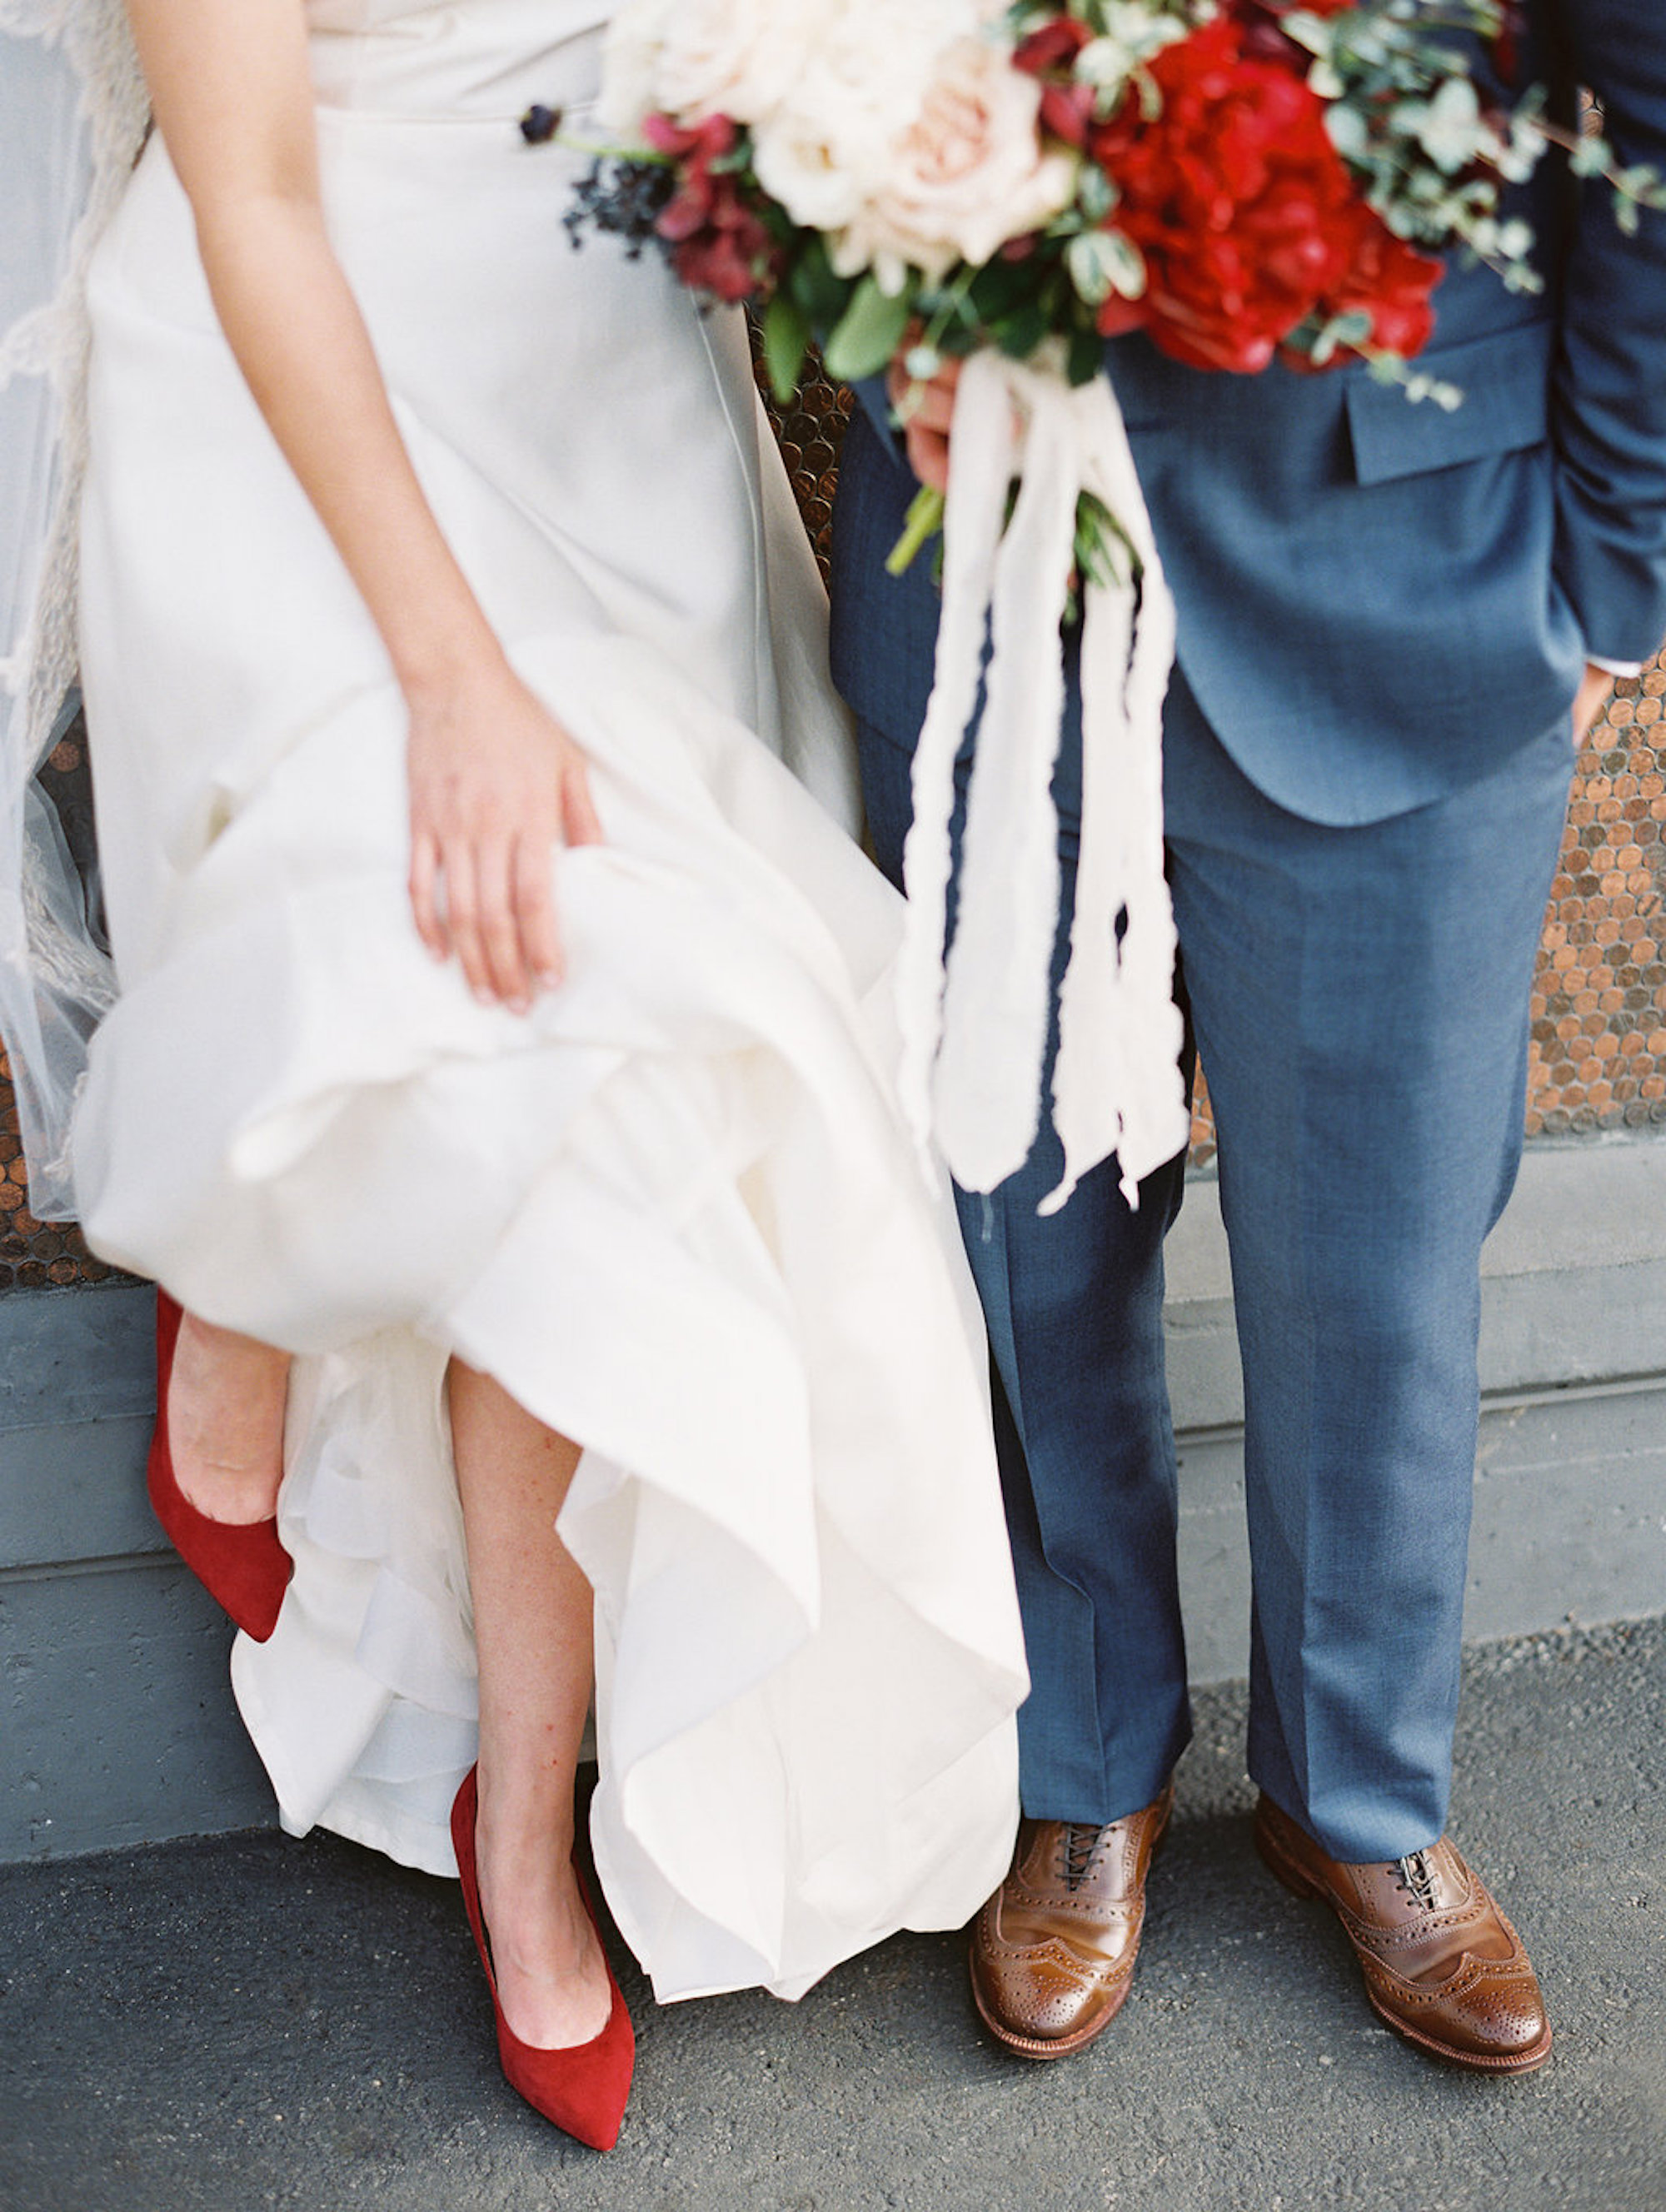 www.santabarbarawedding.com | Lavender & Twine | Michele B. Events | Santa Barbara Courthouse | Bride and Groom